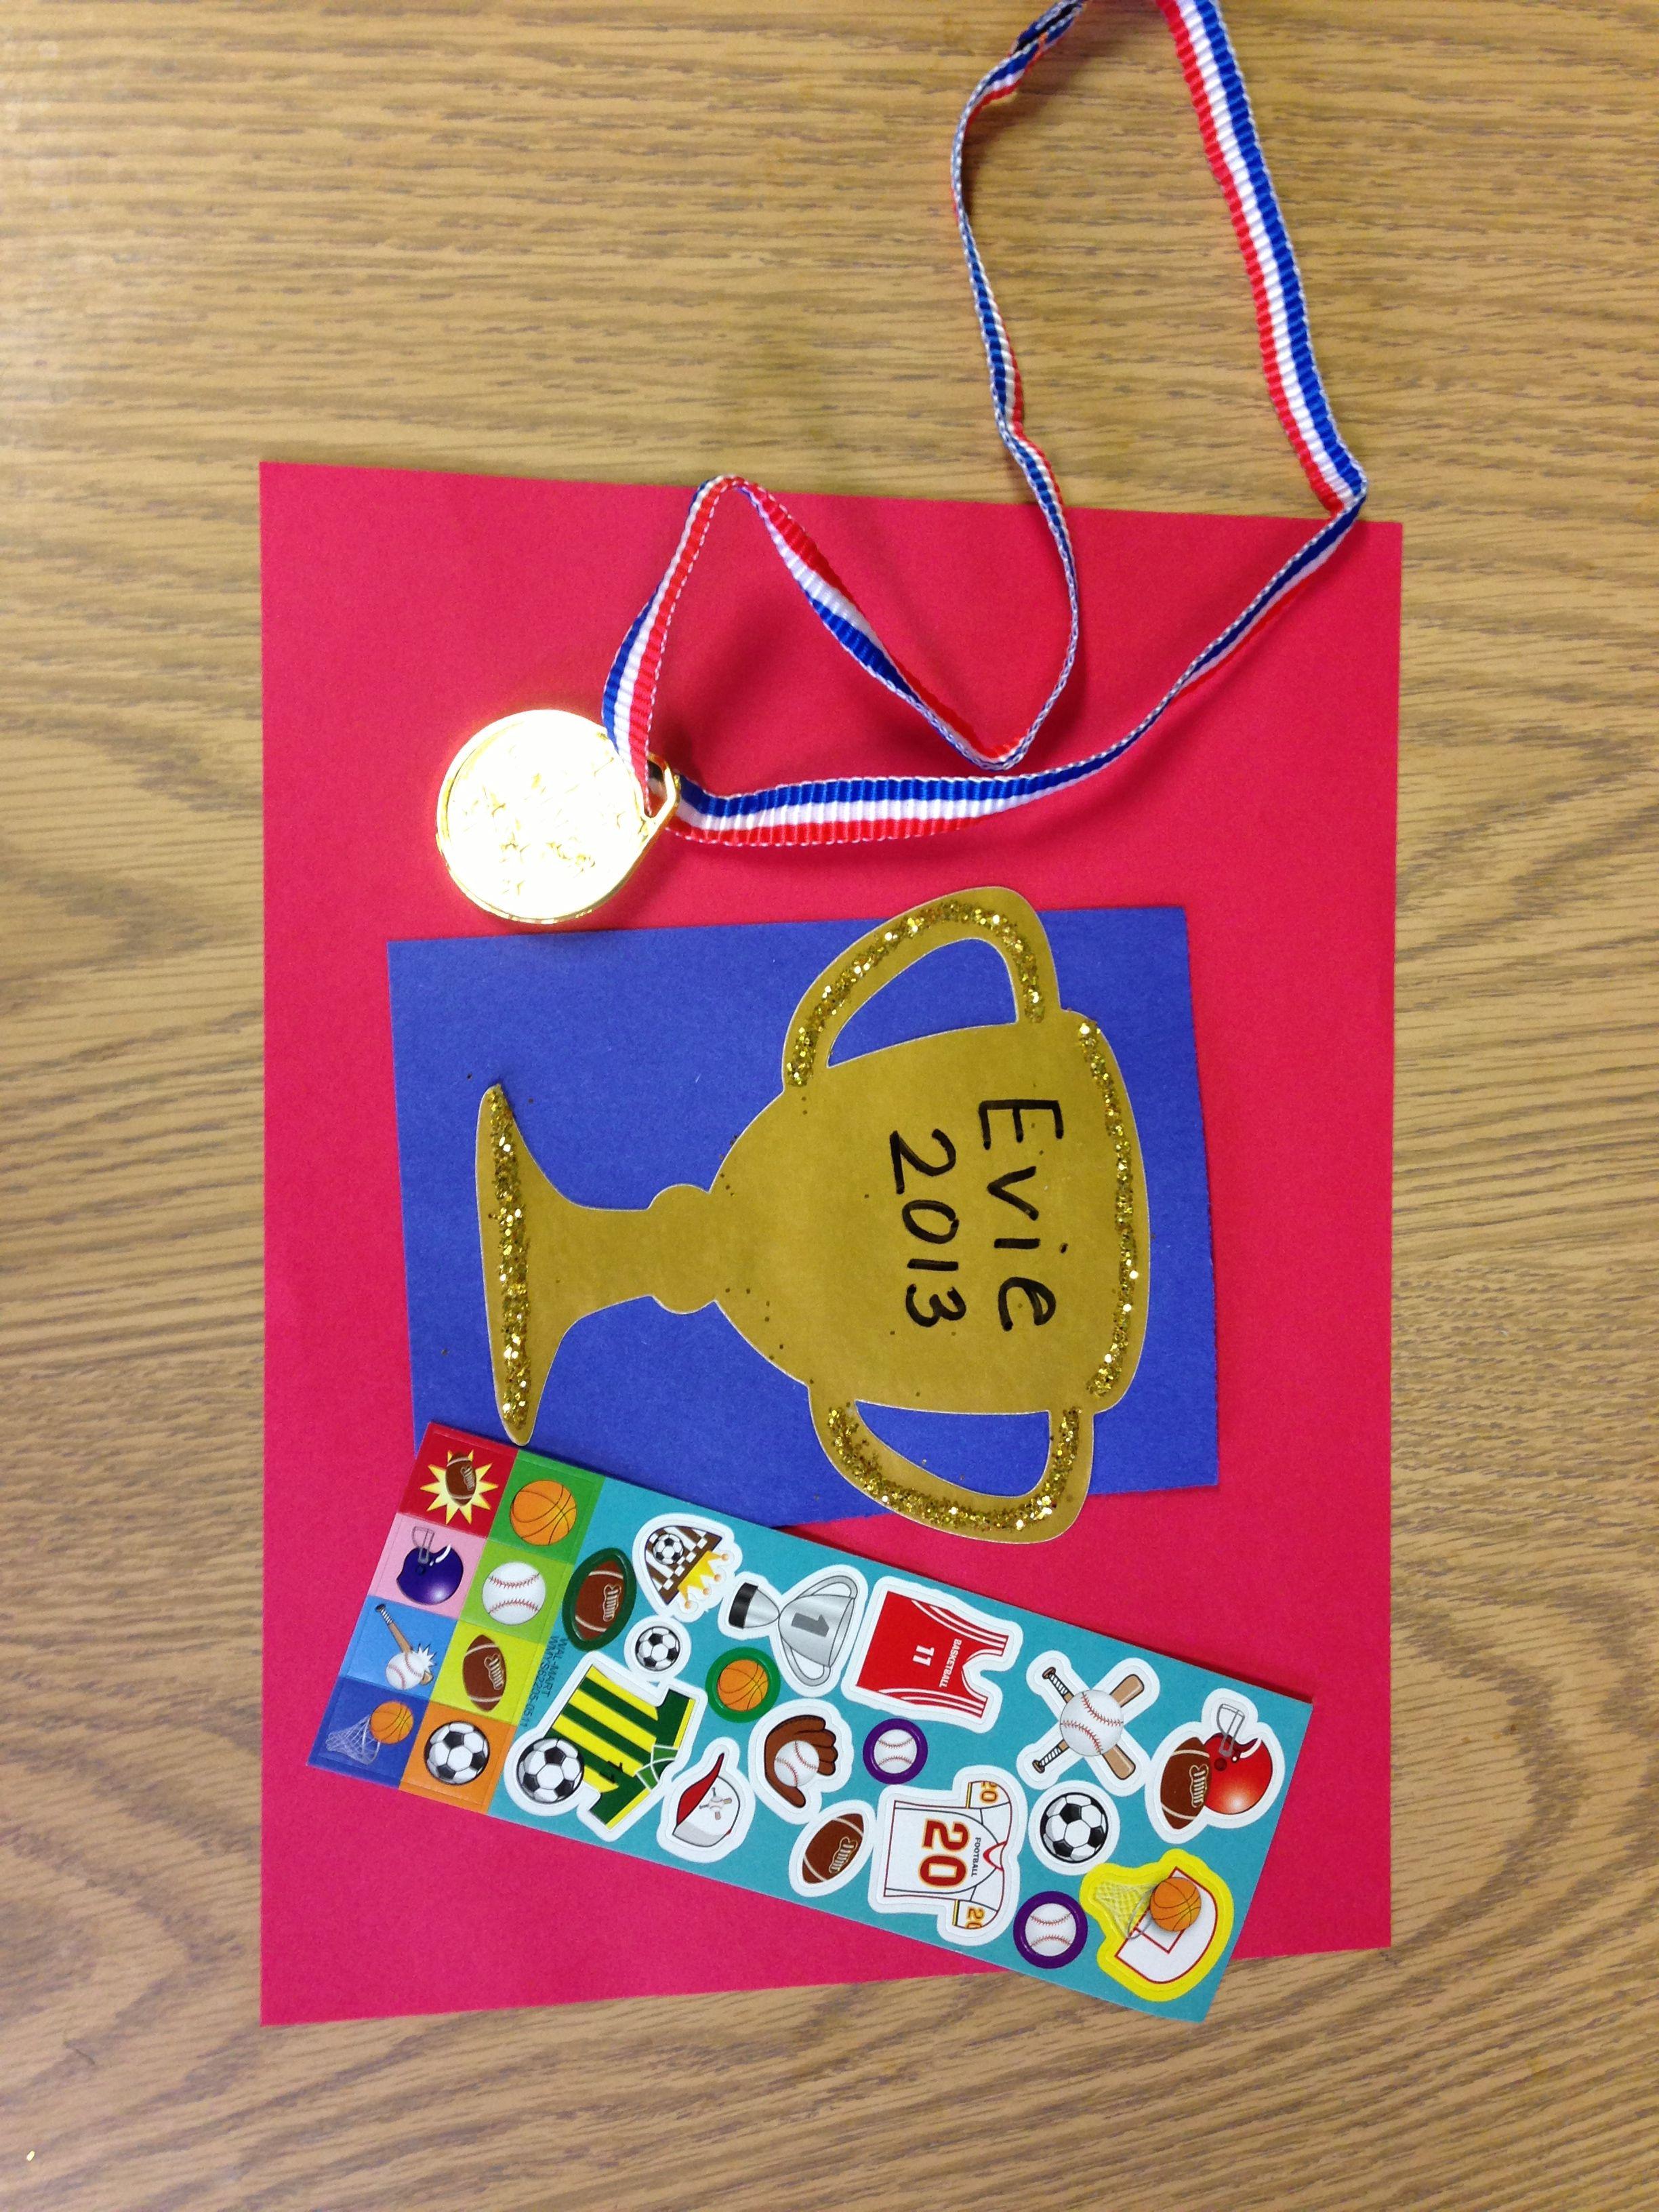 Preschool Olympics Prizes Preschool Olympics Classroom Helps Preschool [ 3264 x 2448 Pixel ]